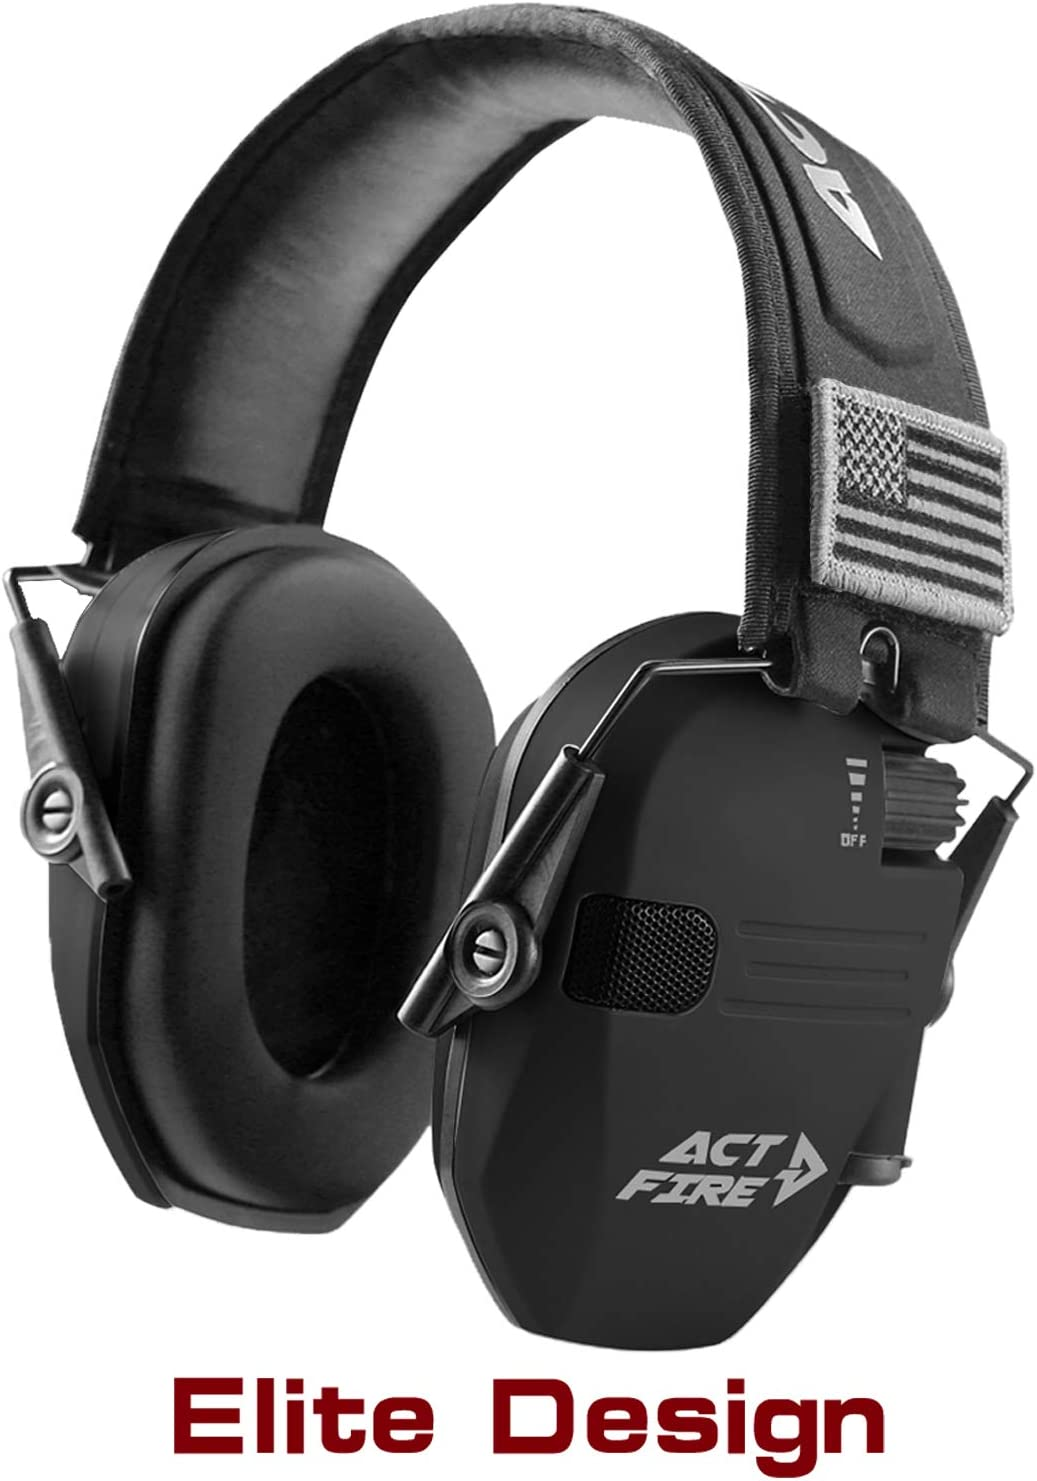 ACT FIRE Shooting Earmuffs, Electronic Ear Protection for Gun Range, Elite Combat Design